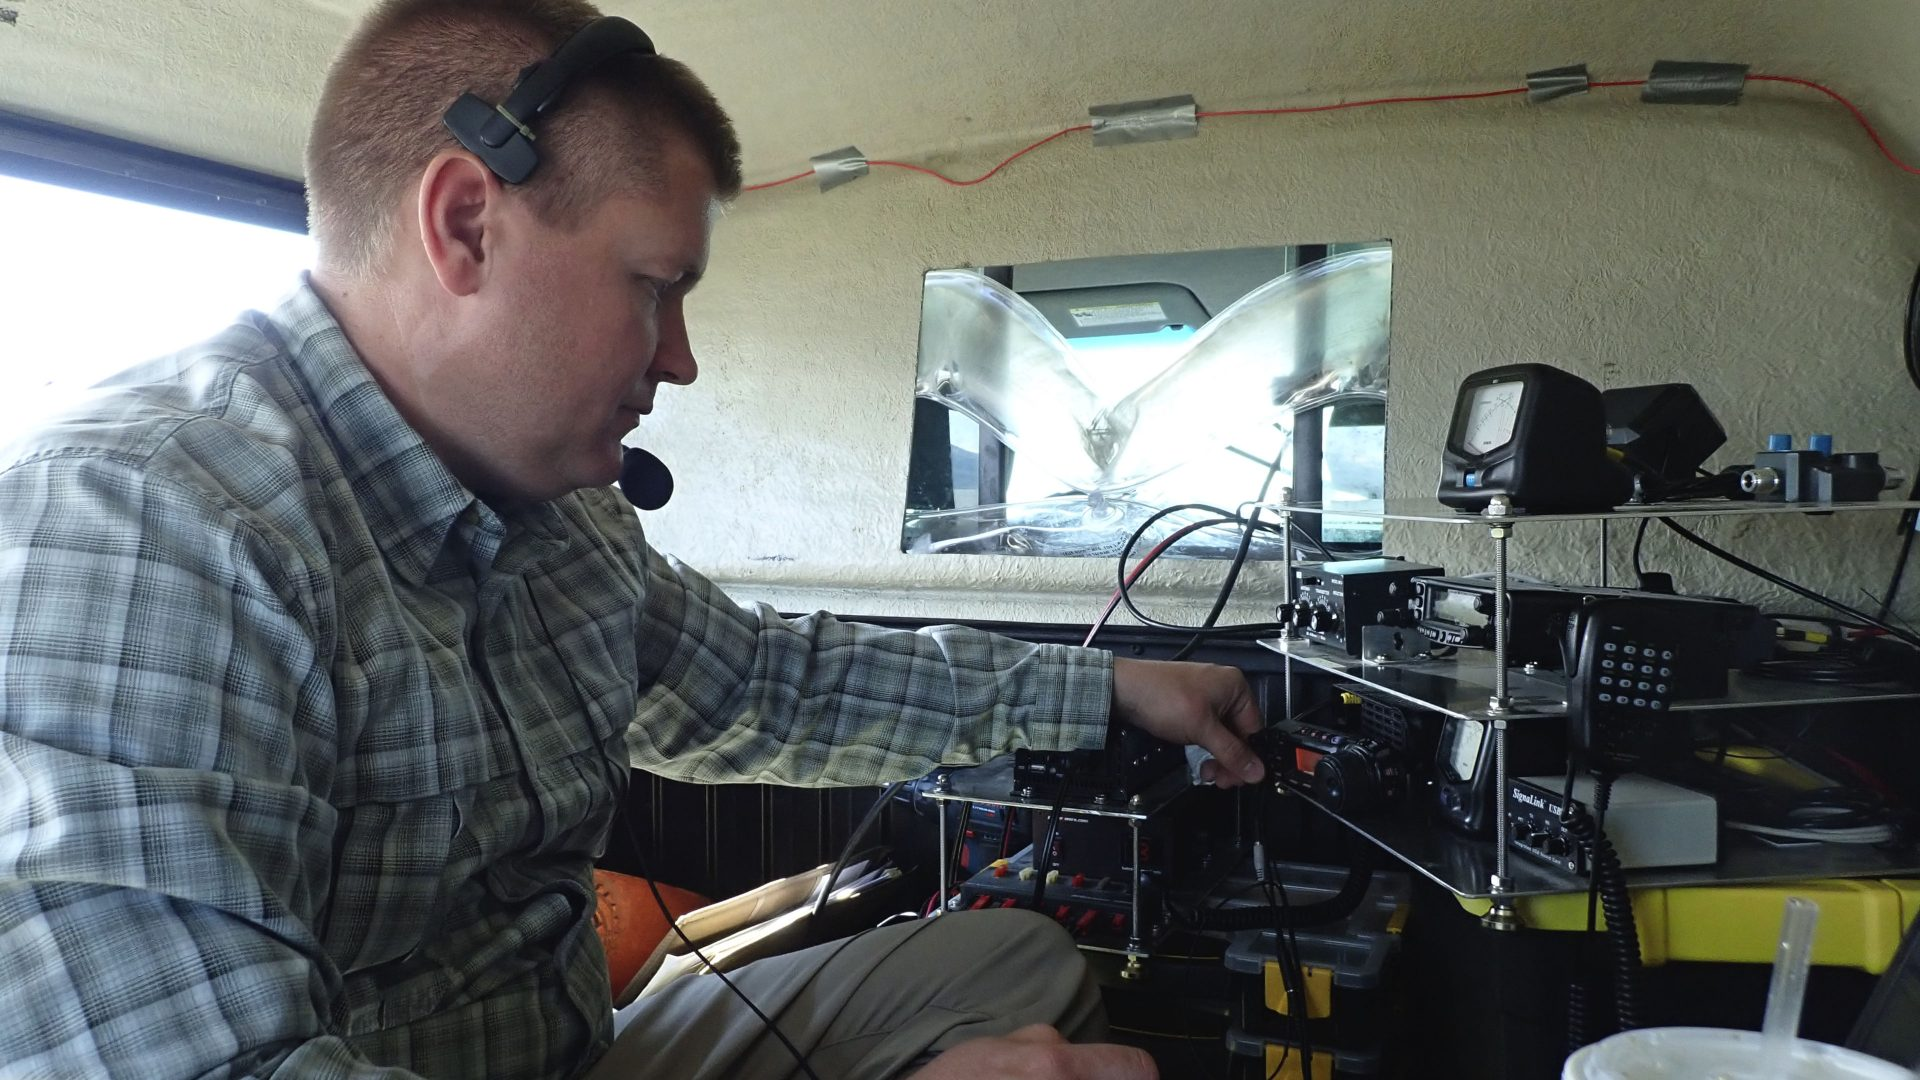 Ham radio operator contesting VHF rover